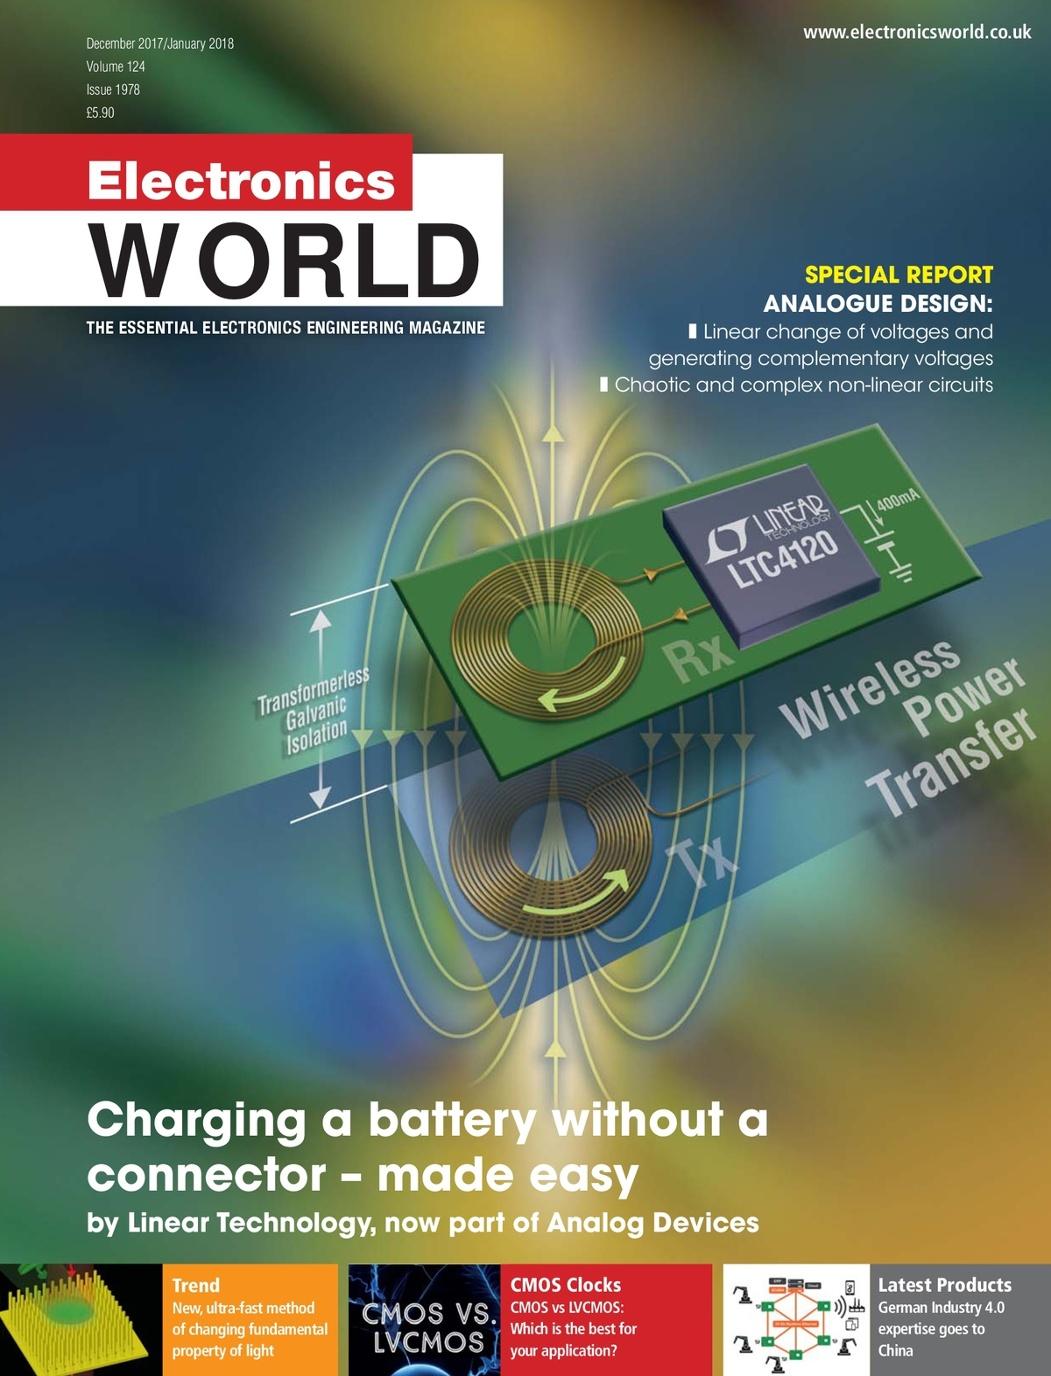 Electronics World December2017 January 2018 Electronic Circuit Simulator Javascript Page 1